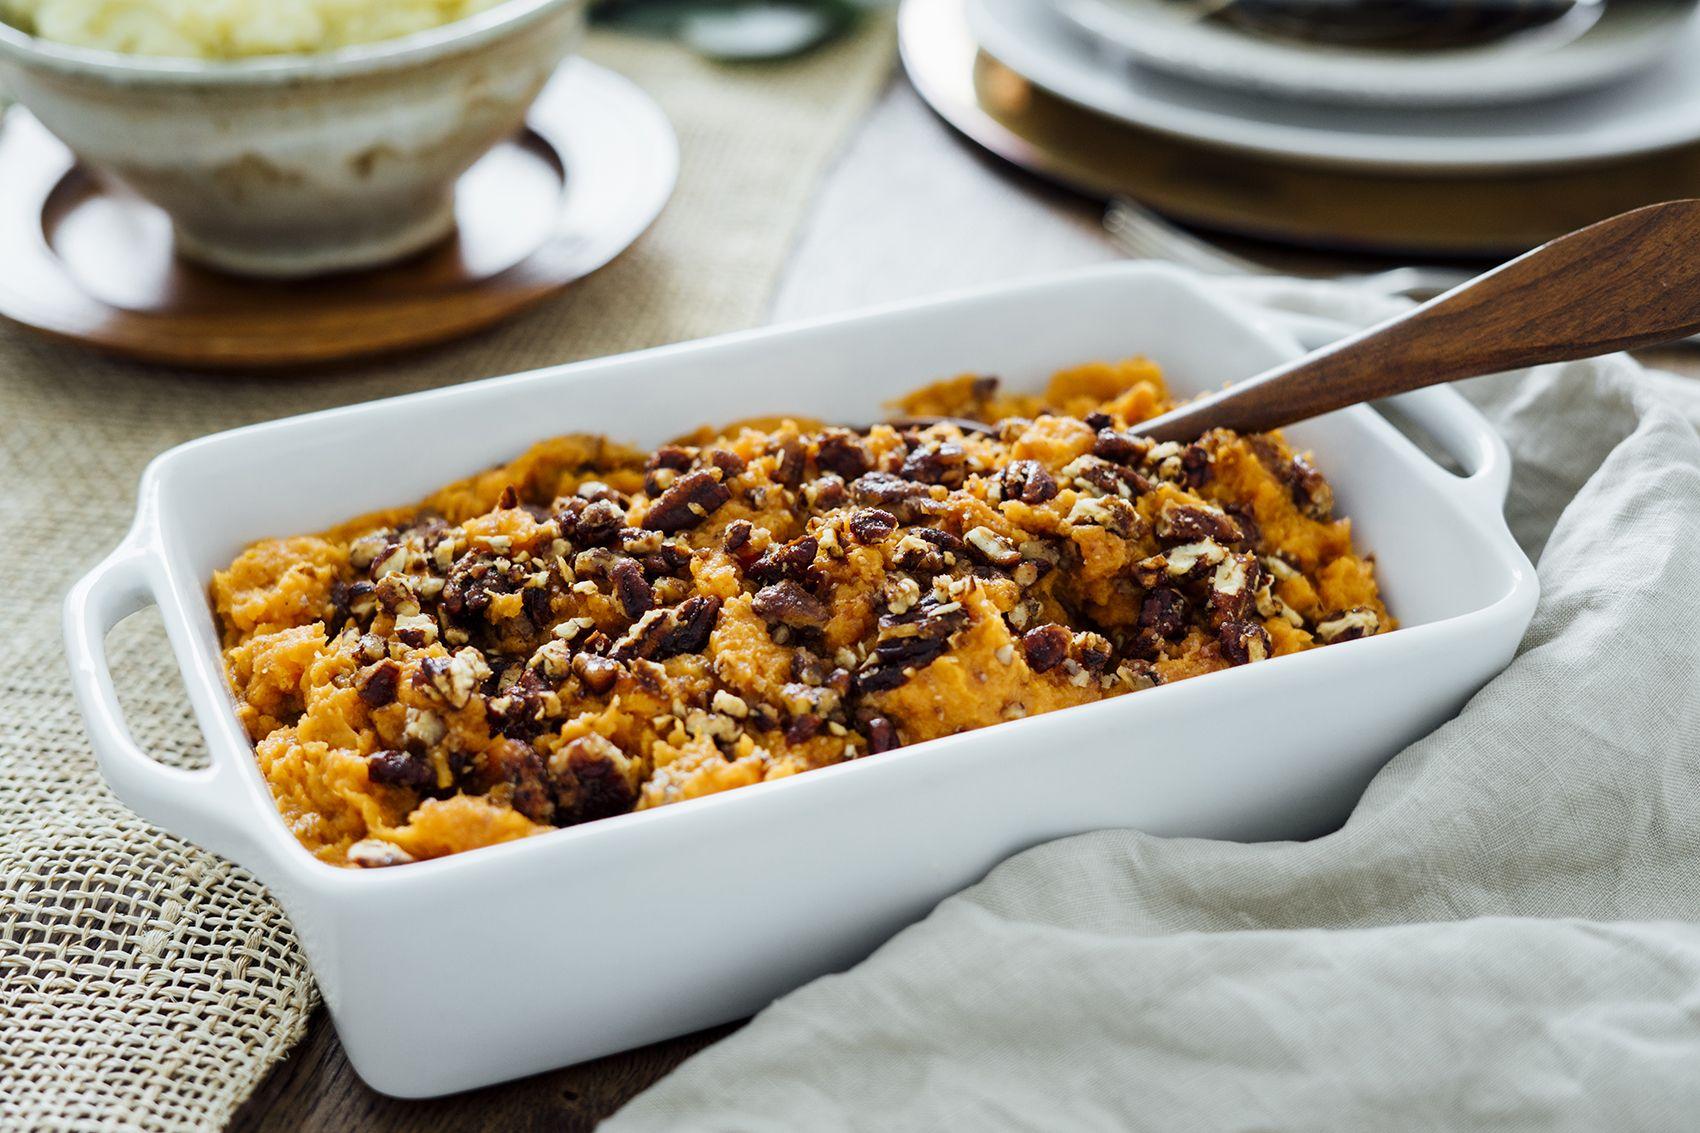 Thanksgiving Turkey, Sides and Pies Sweet potato pecan